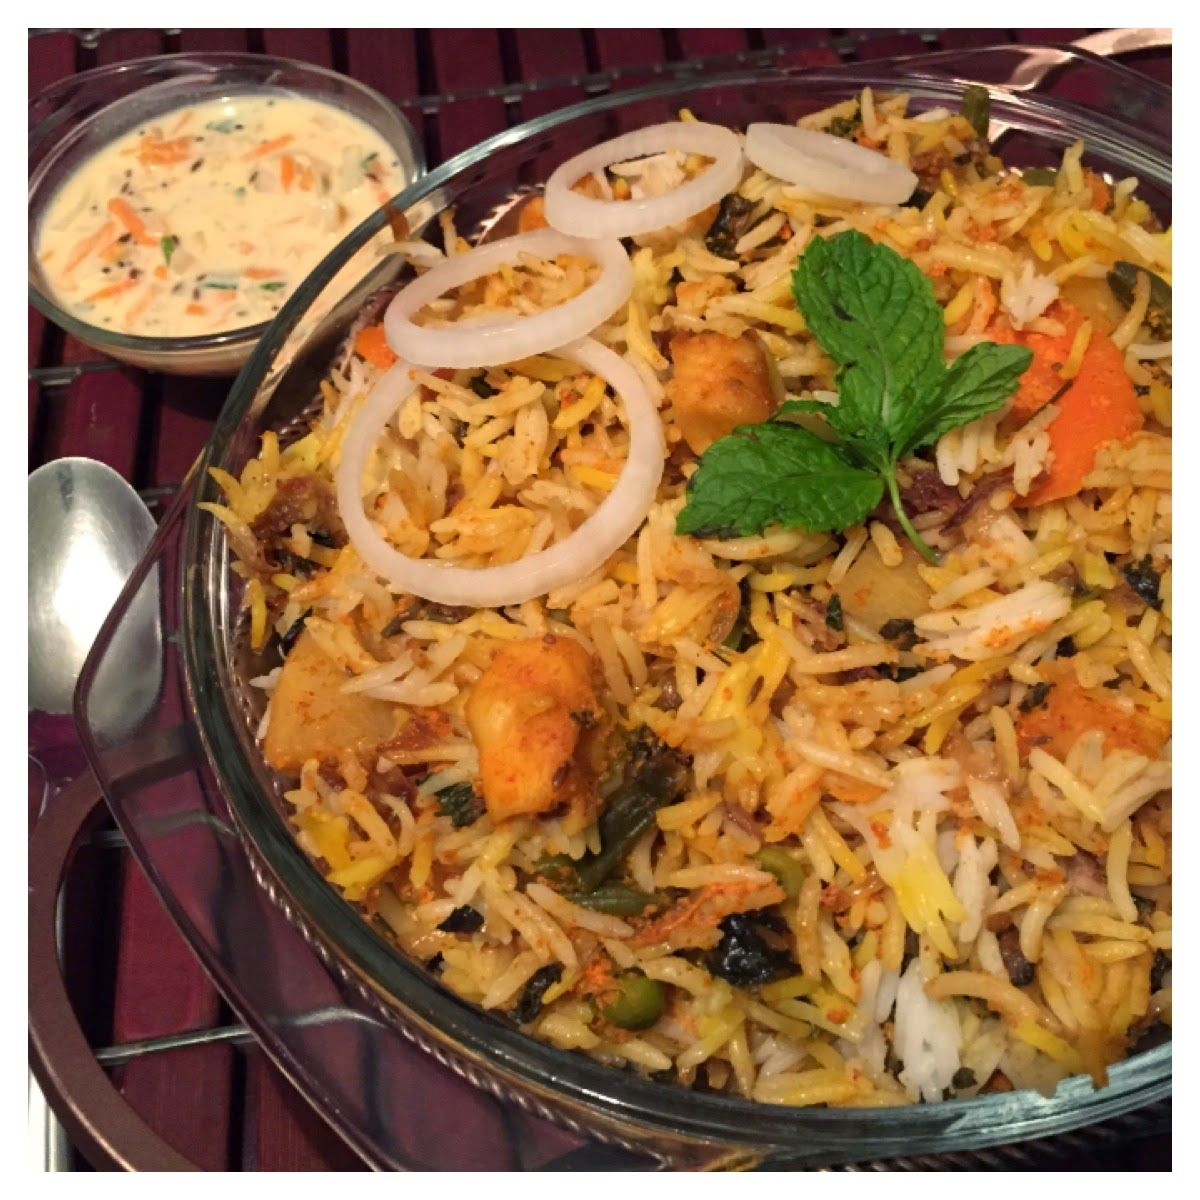 Vegetable Biriyani Vegetarian Crockpot Recipes Crockpot Indian Recipes Indian Food Recipes